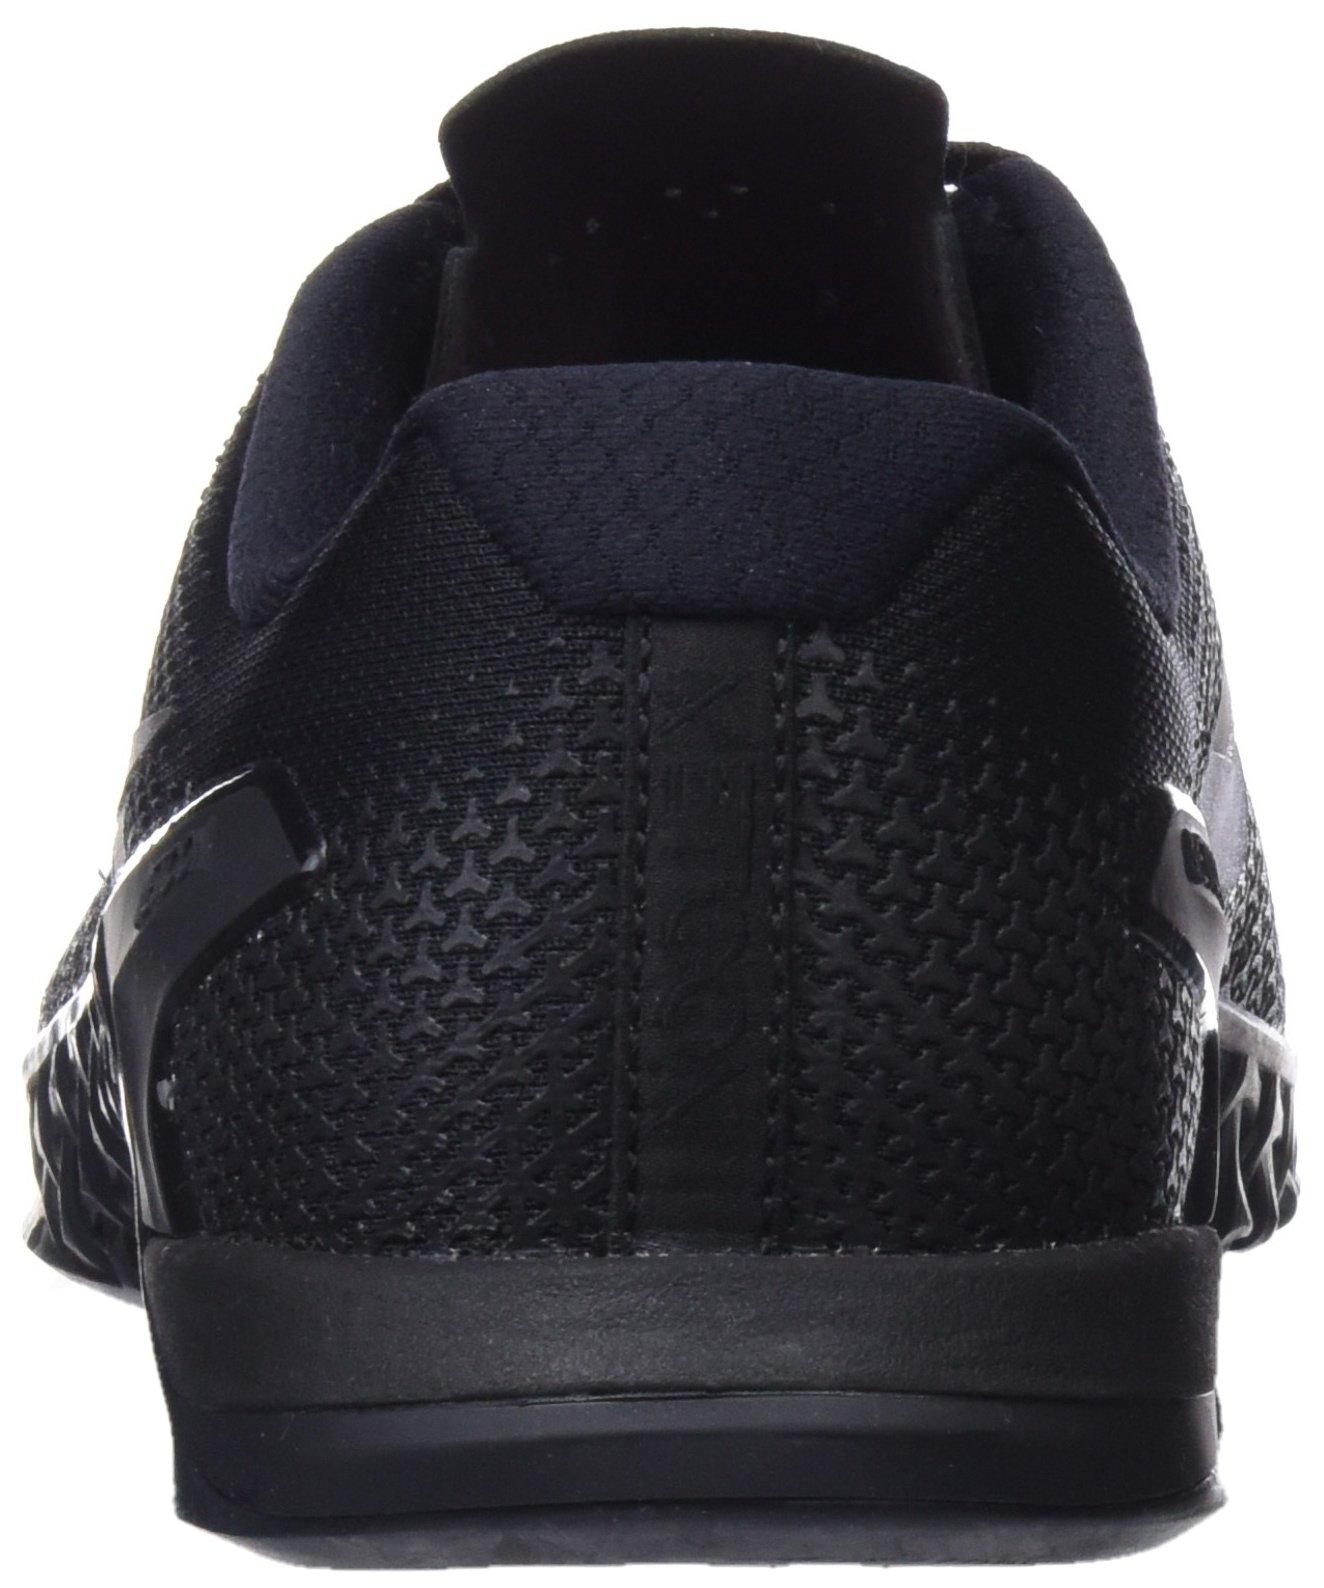 Nike Men's Metcon 4 Training Shoe Black/Black-Black-Hyper Crimson 7.5 by Nike (Image #2)